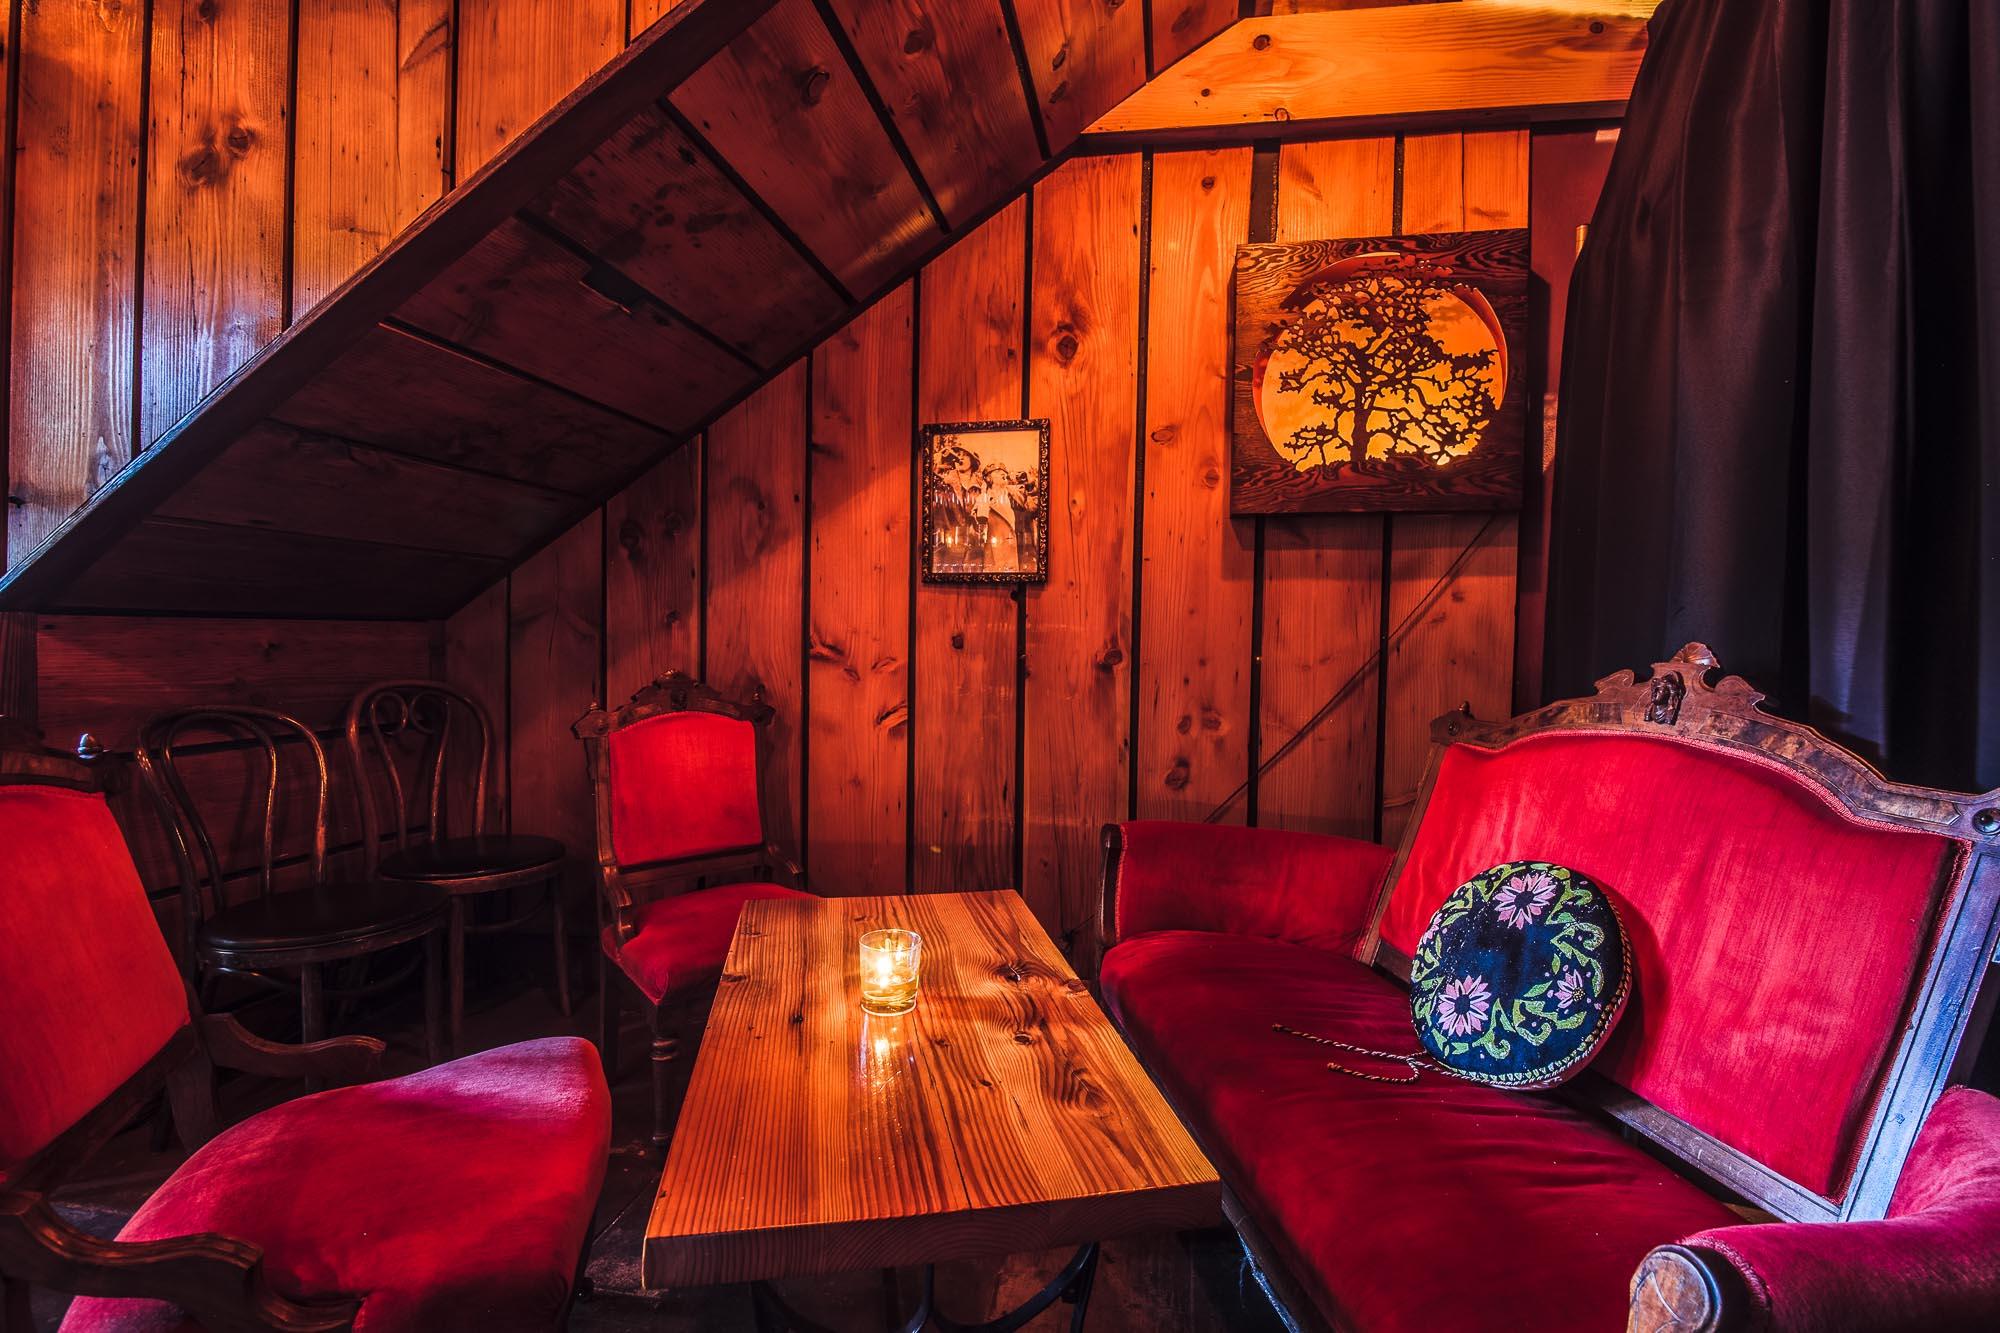 visit-sellwood-moreland-business-alliance_corkscrew-wine-bar-4.jpg